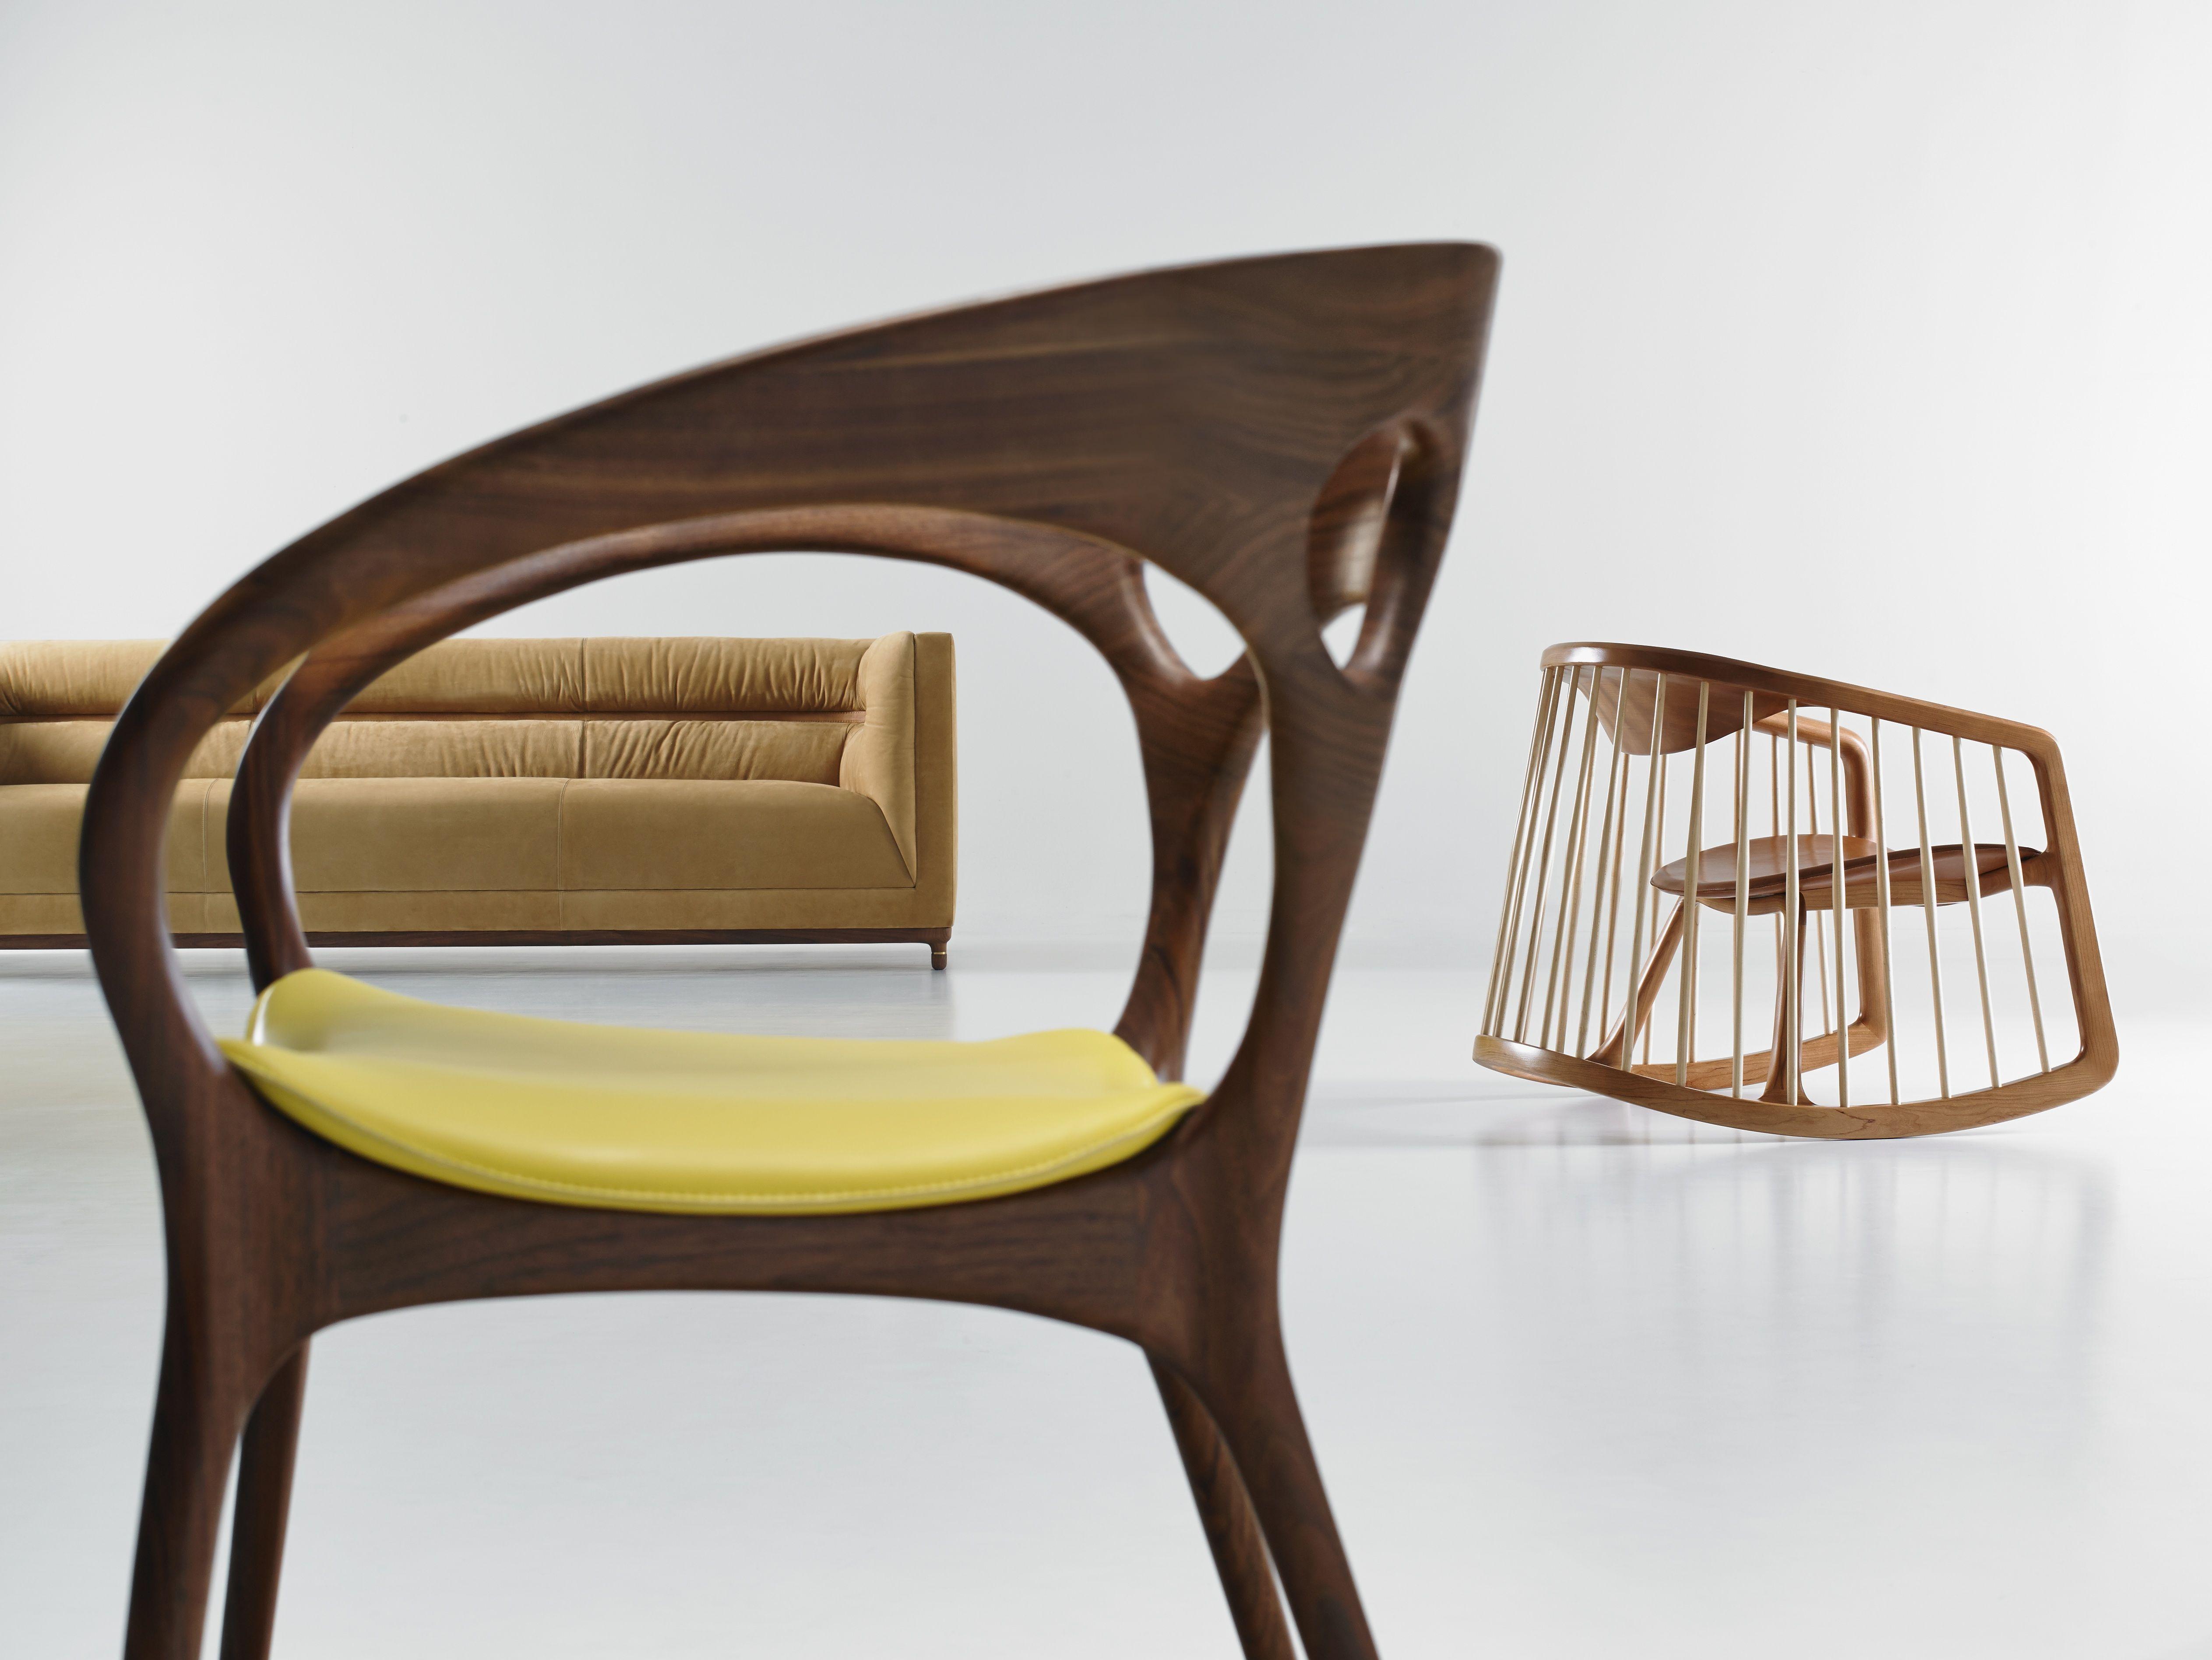 Bernhardt Chairs By Noé Duchaufour Lawrance, Jephson Robb, And Ross  Lovegrove.